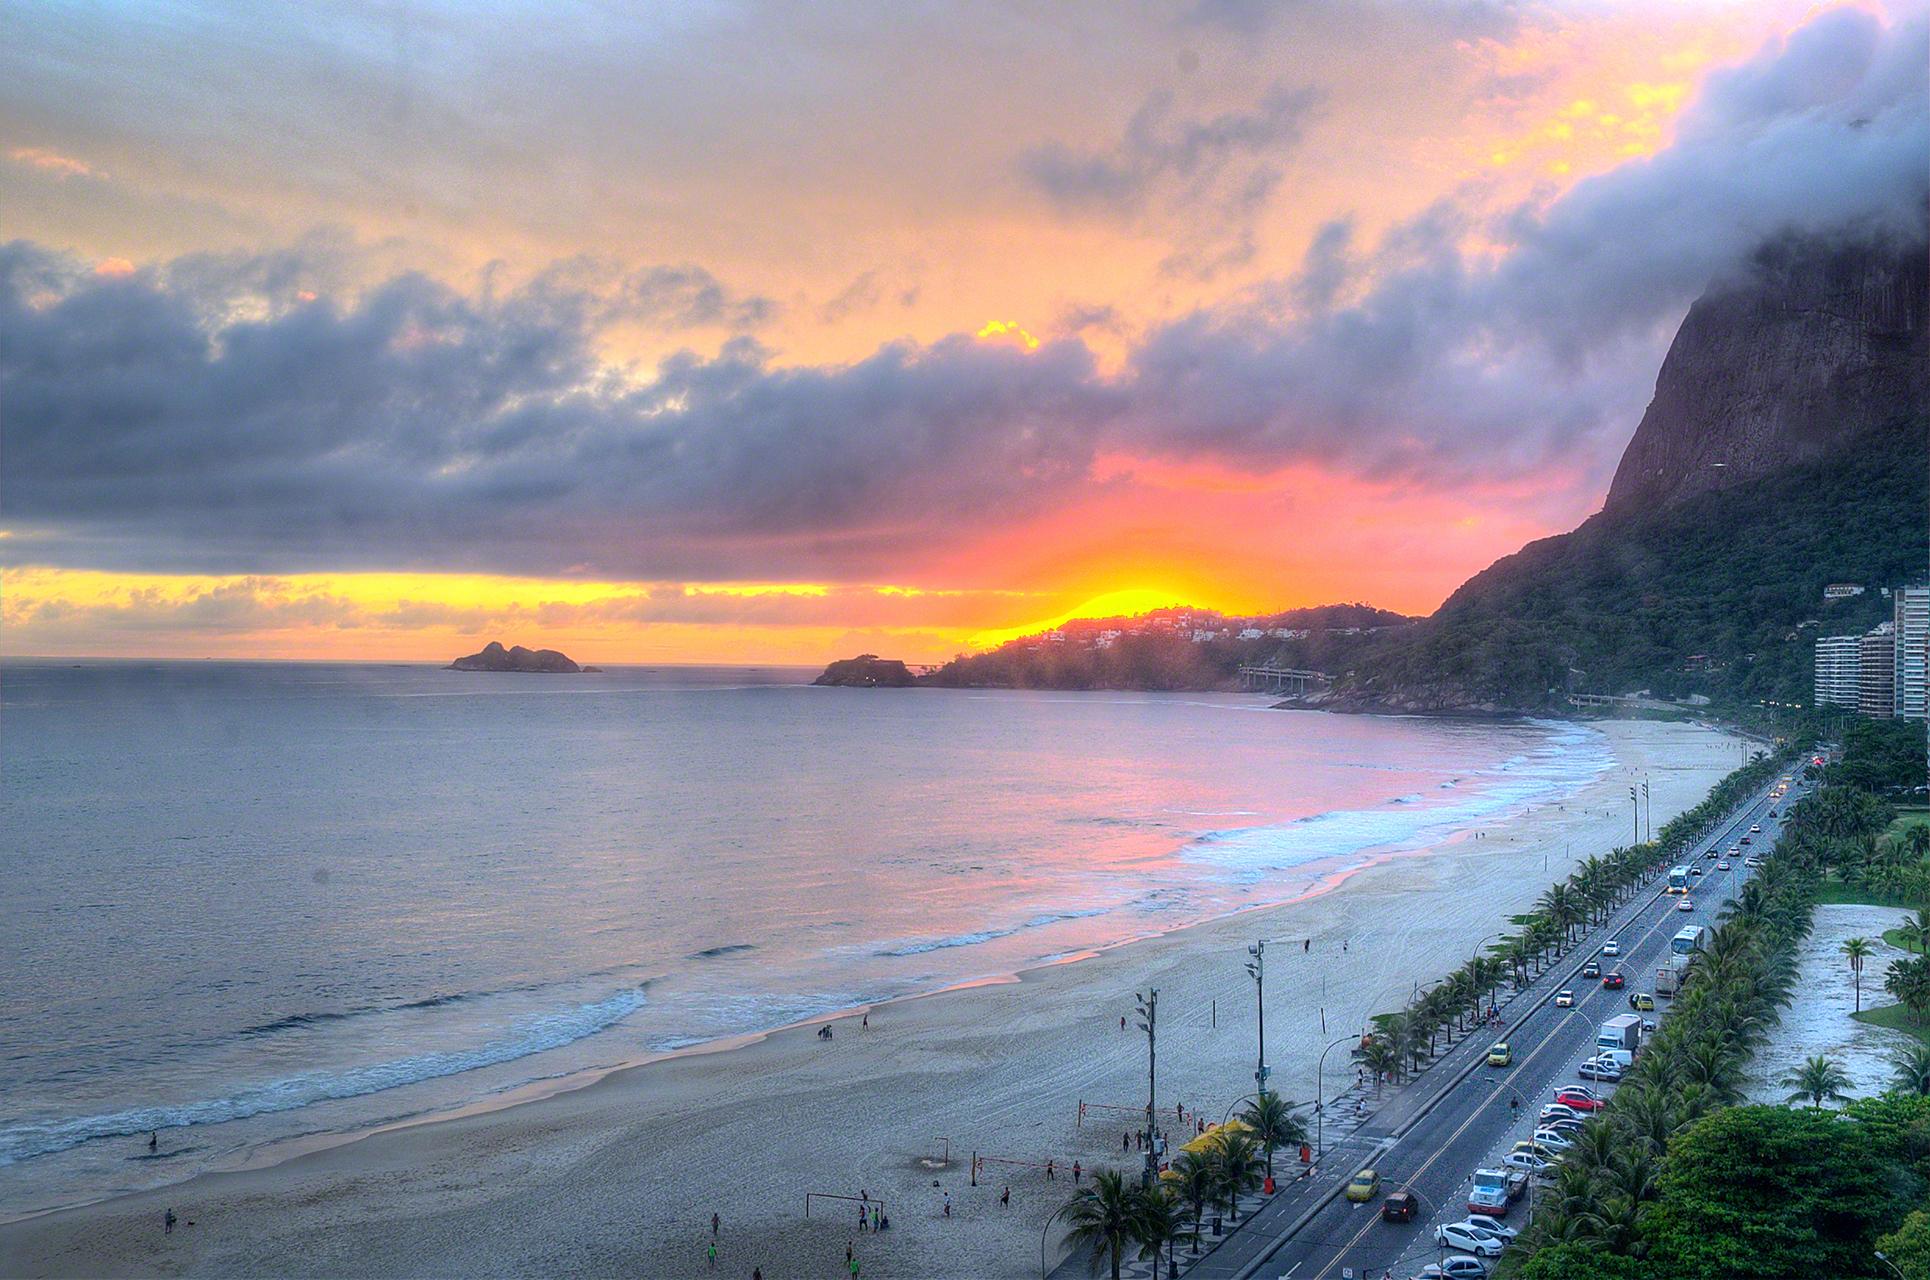 Fireball Sunset on the Beach in Rio, Brazil